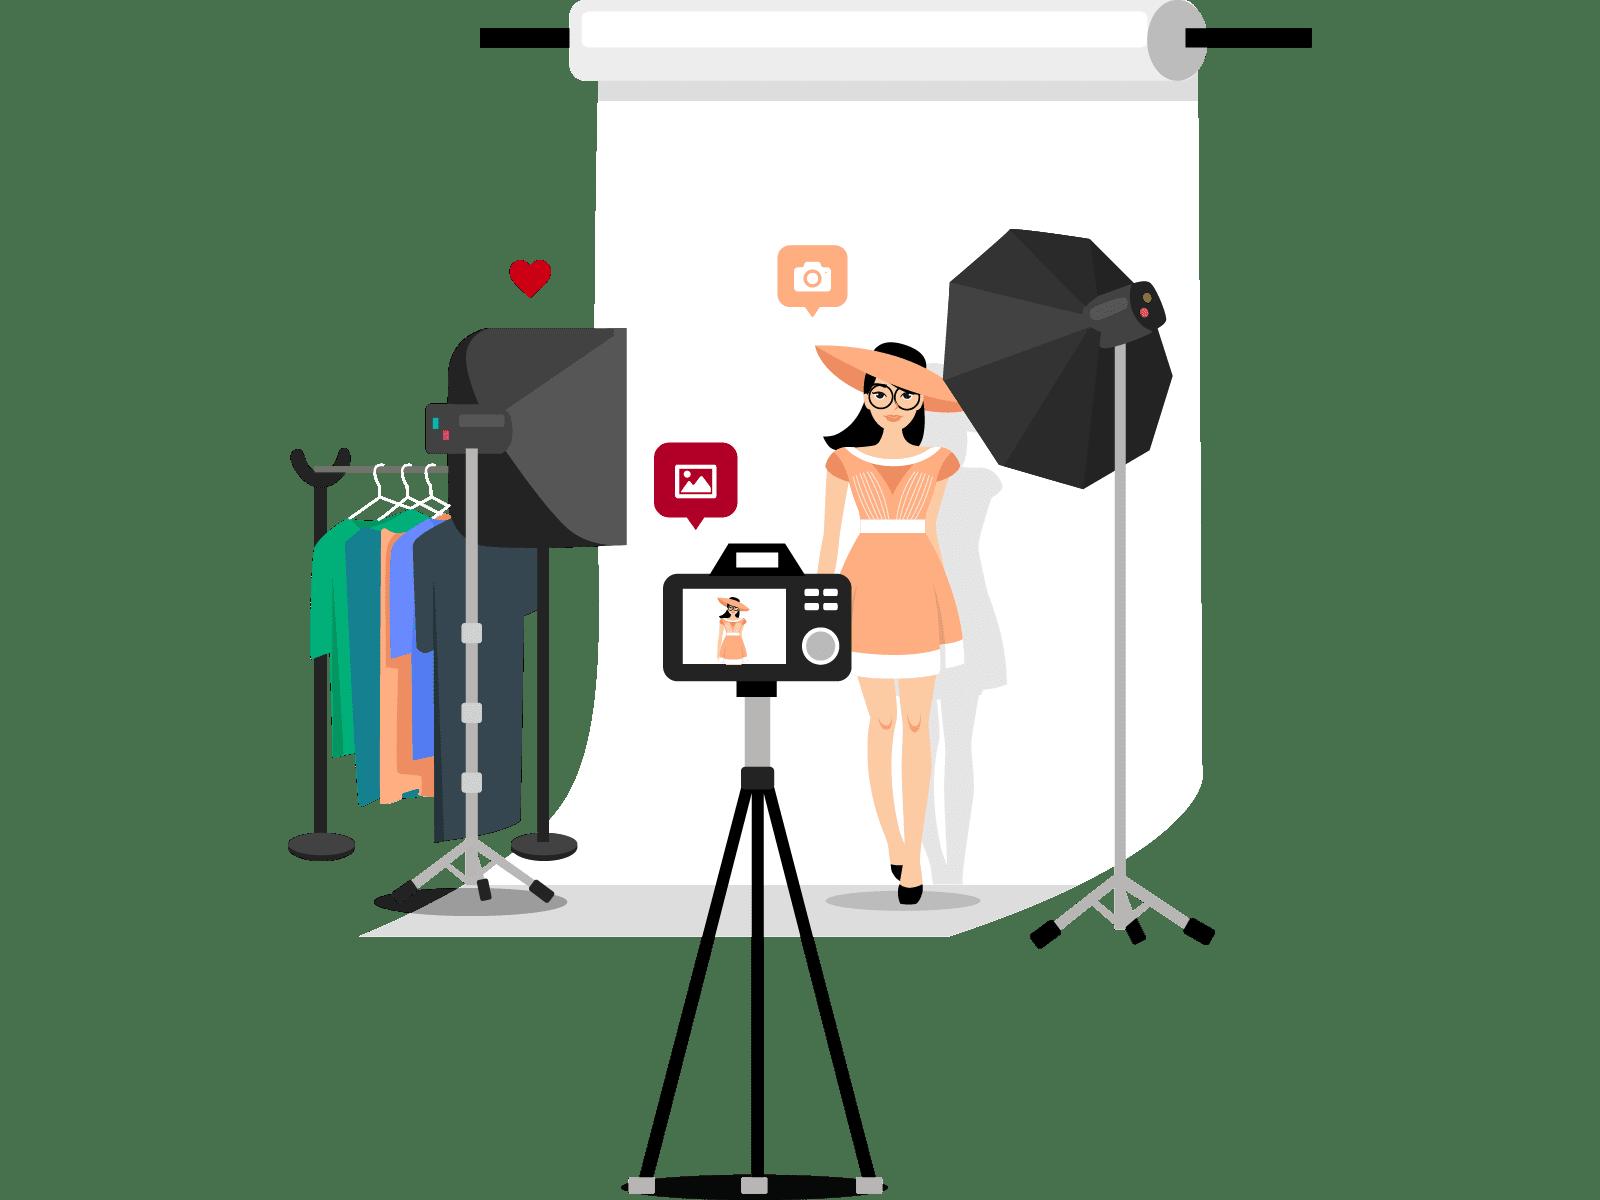 BEAUTYSHOTS Fotoshooting - Schritt 4: Fotoshooting genießen